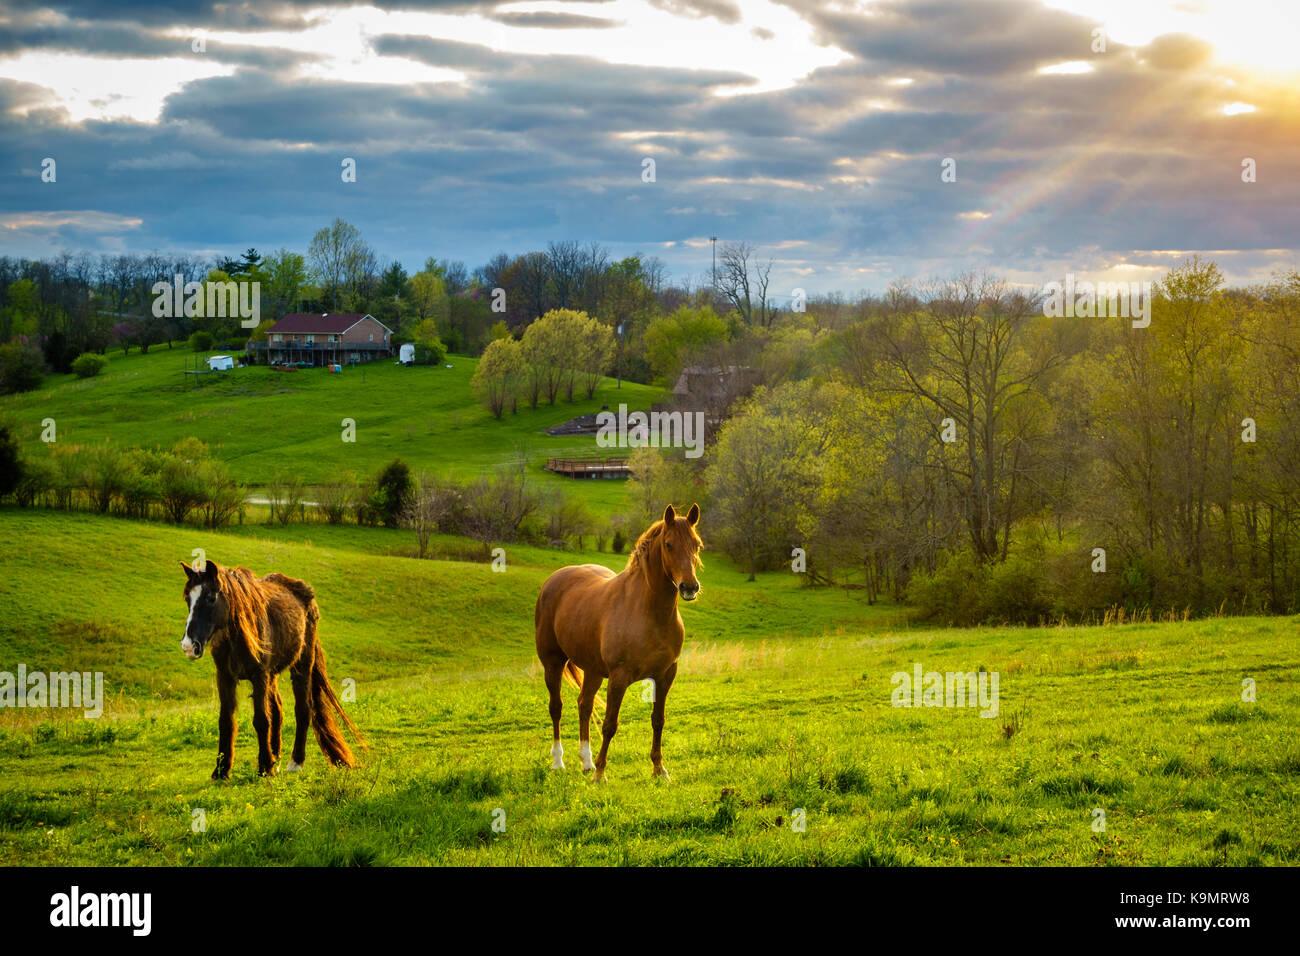 Chestnut Horses Stock Photos & Chestnut Horses Stock ... - photo#16